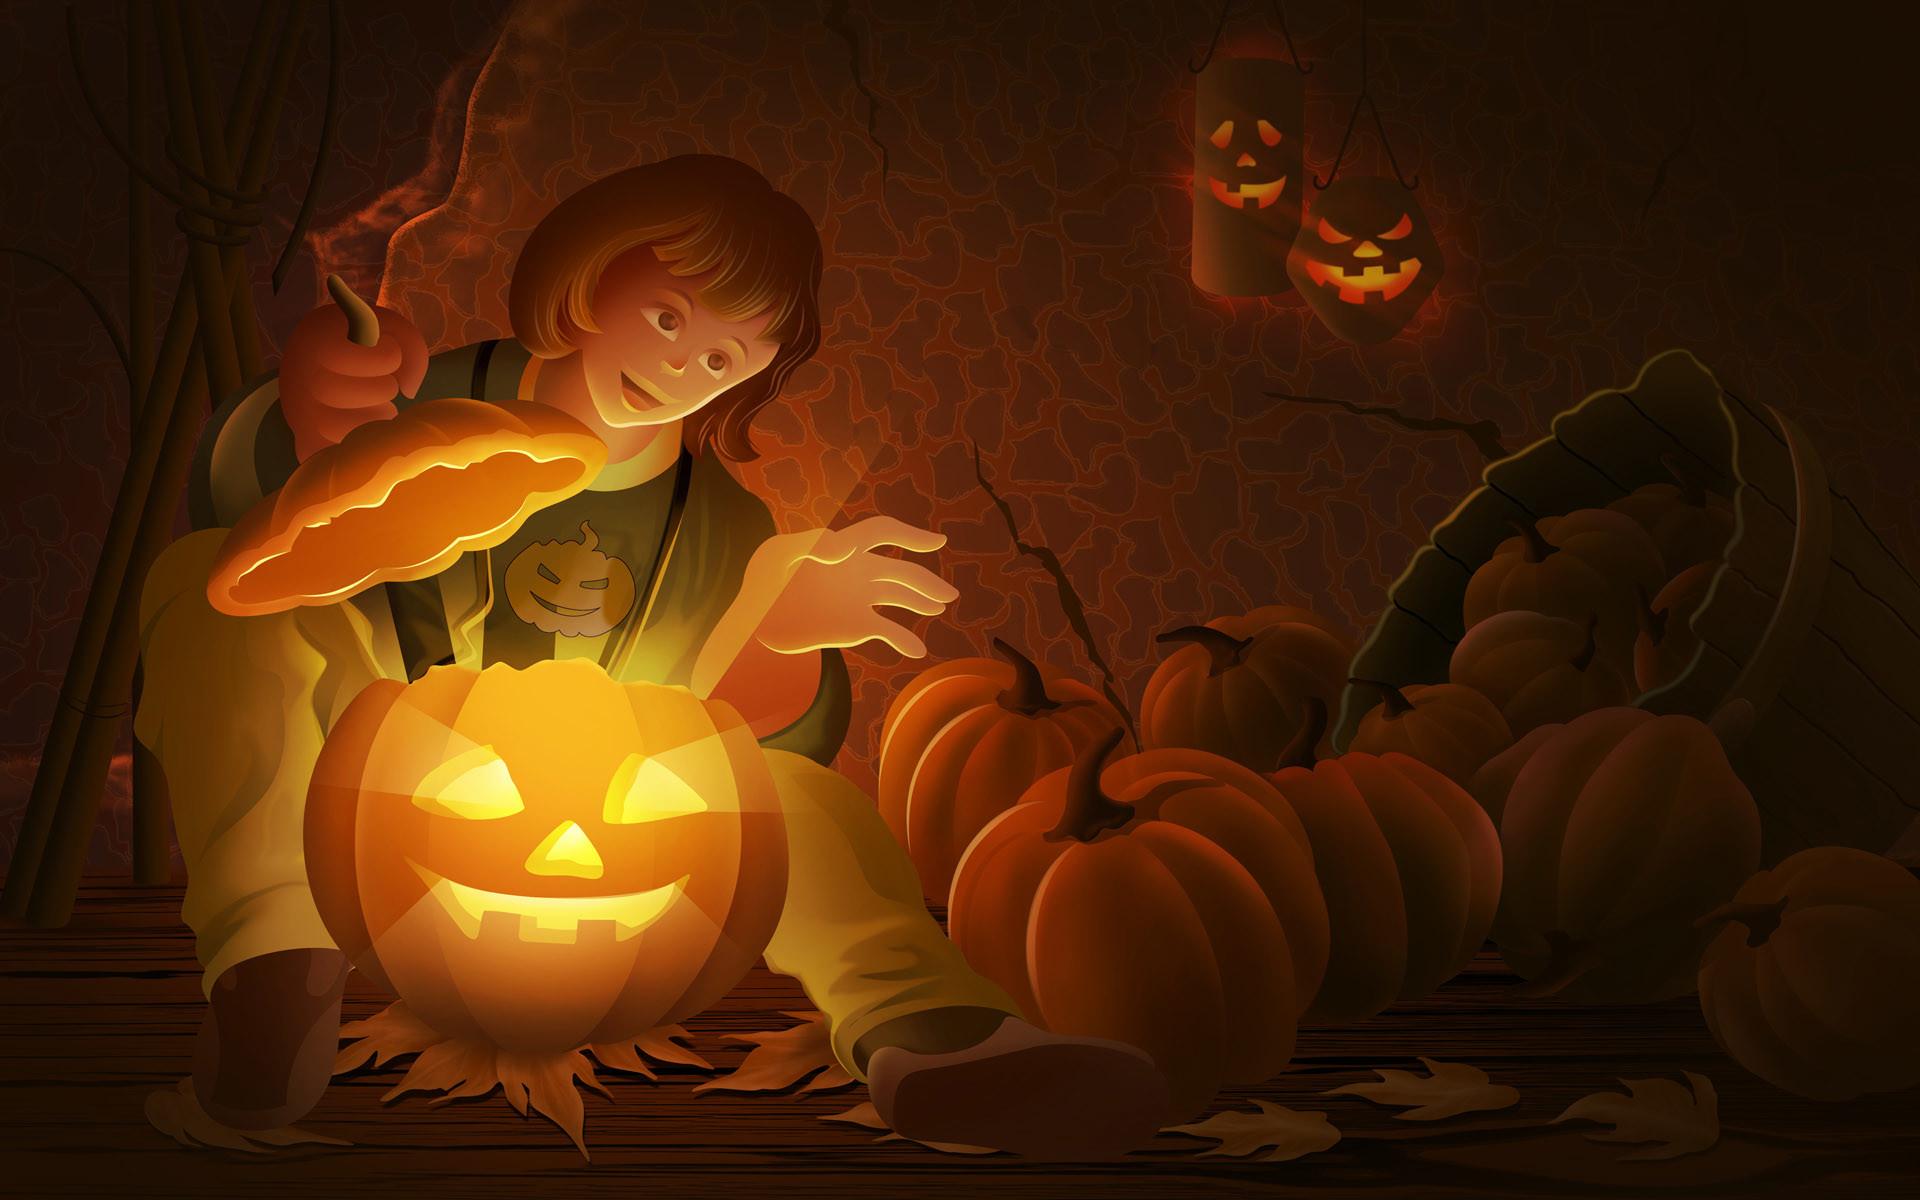 Cute Anime Halloween Wallpaper 21478wall.jpg